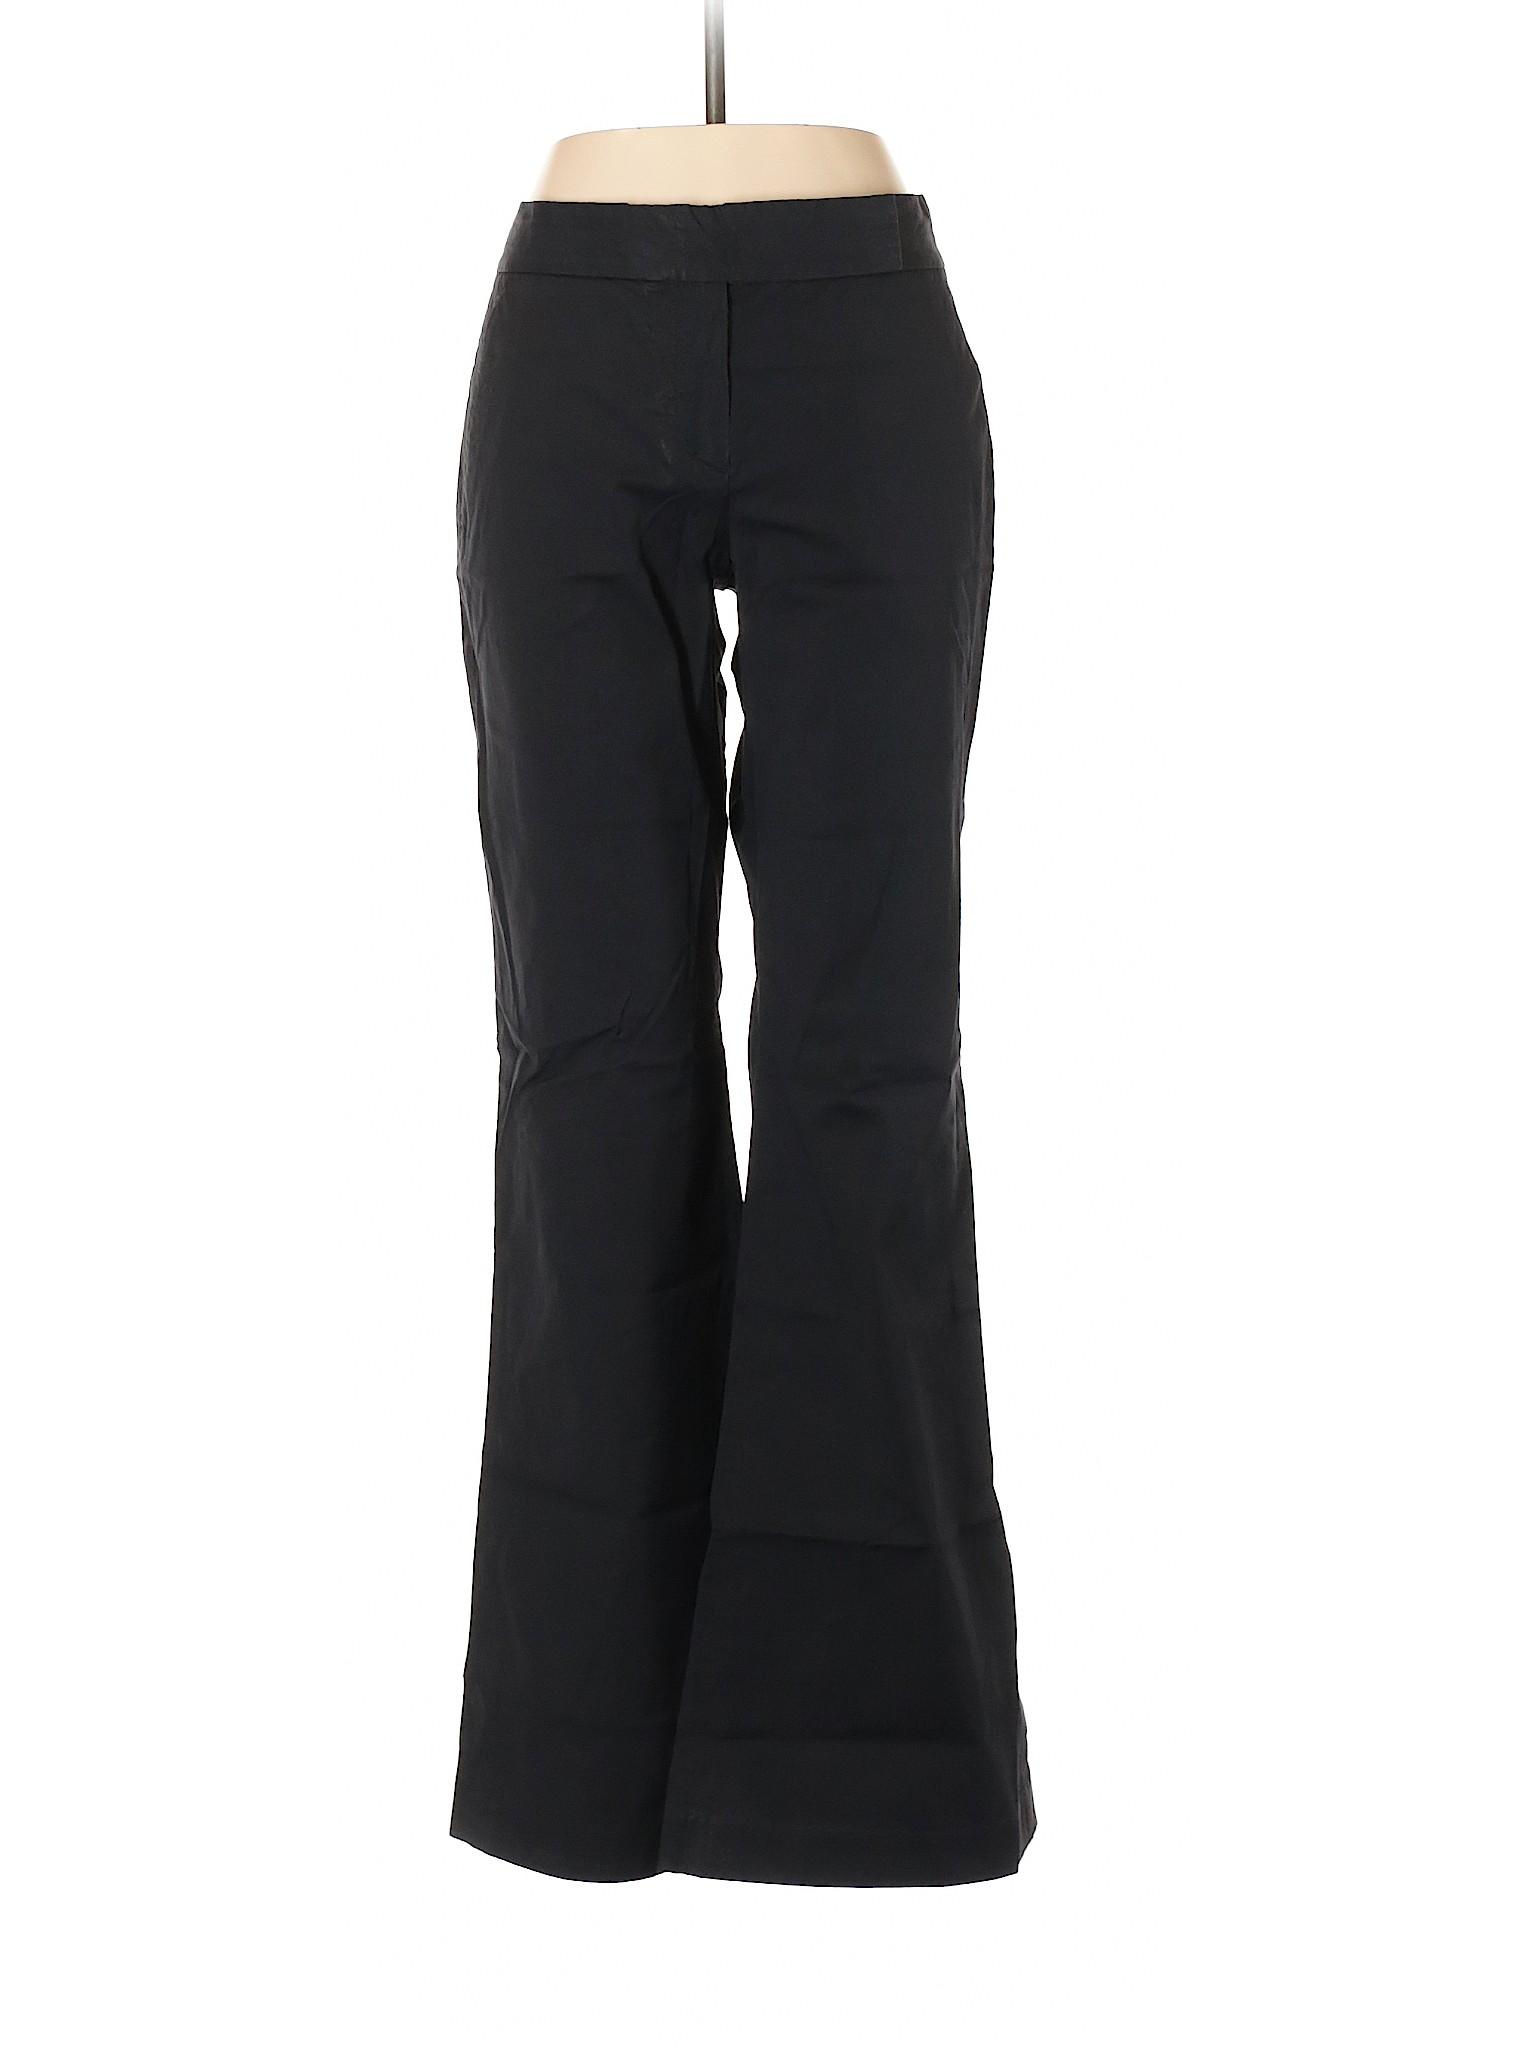 Boutique Pants leisure leisure Boutique Theory Pants Dress Boutique Theory leisure Dress qnwtSU4p